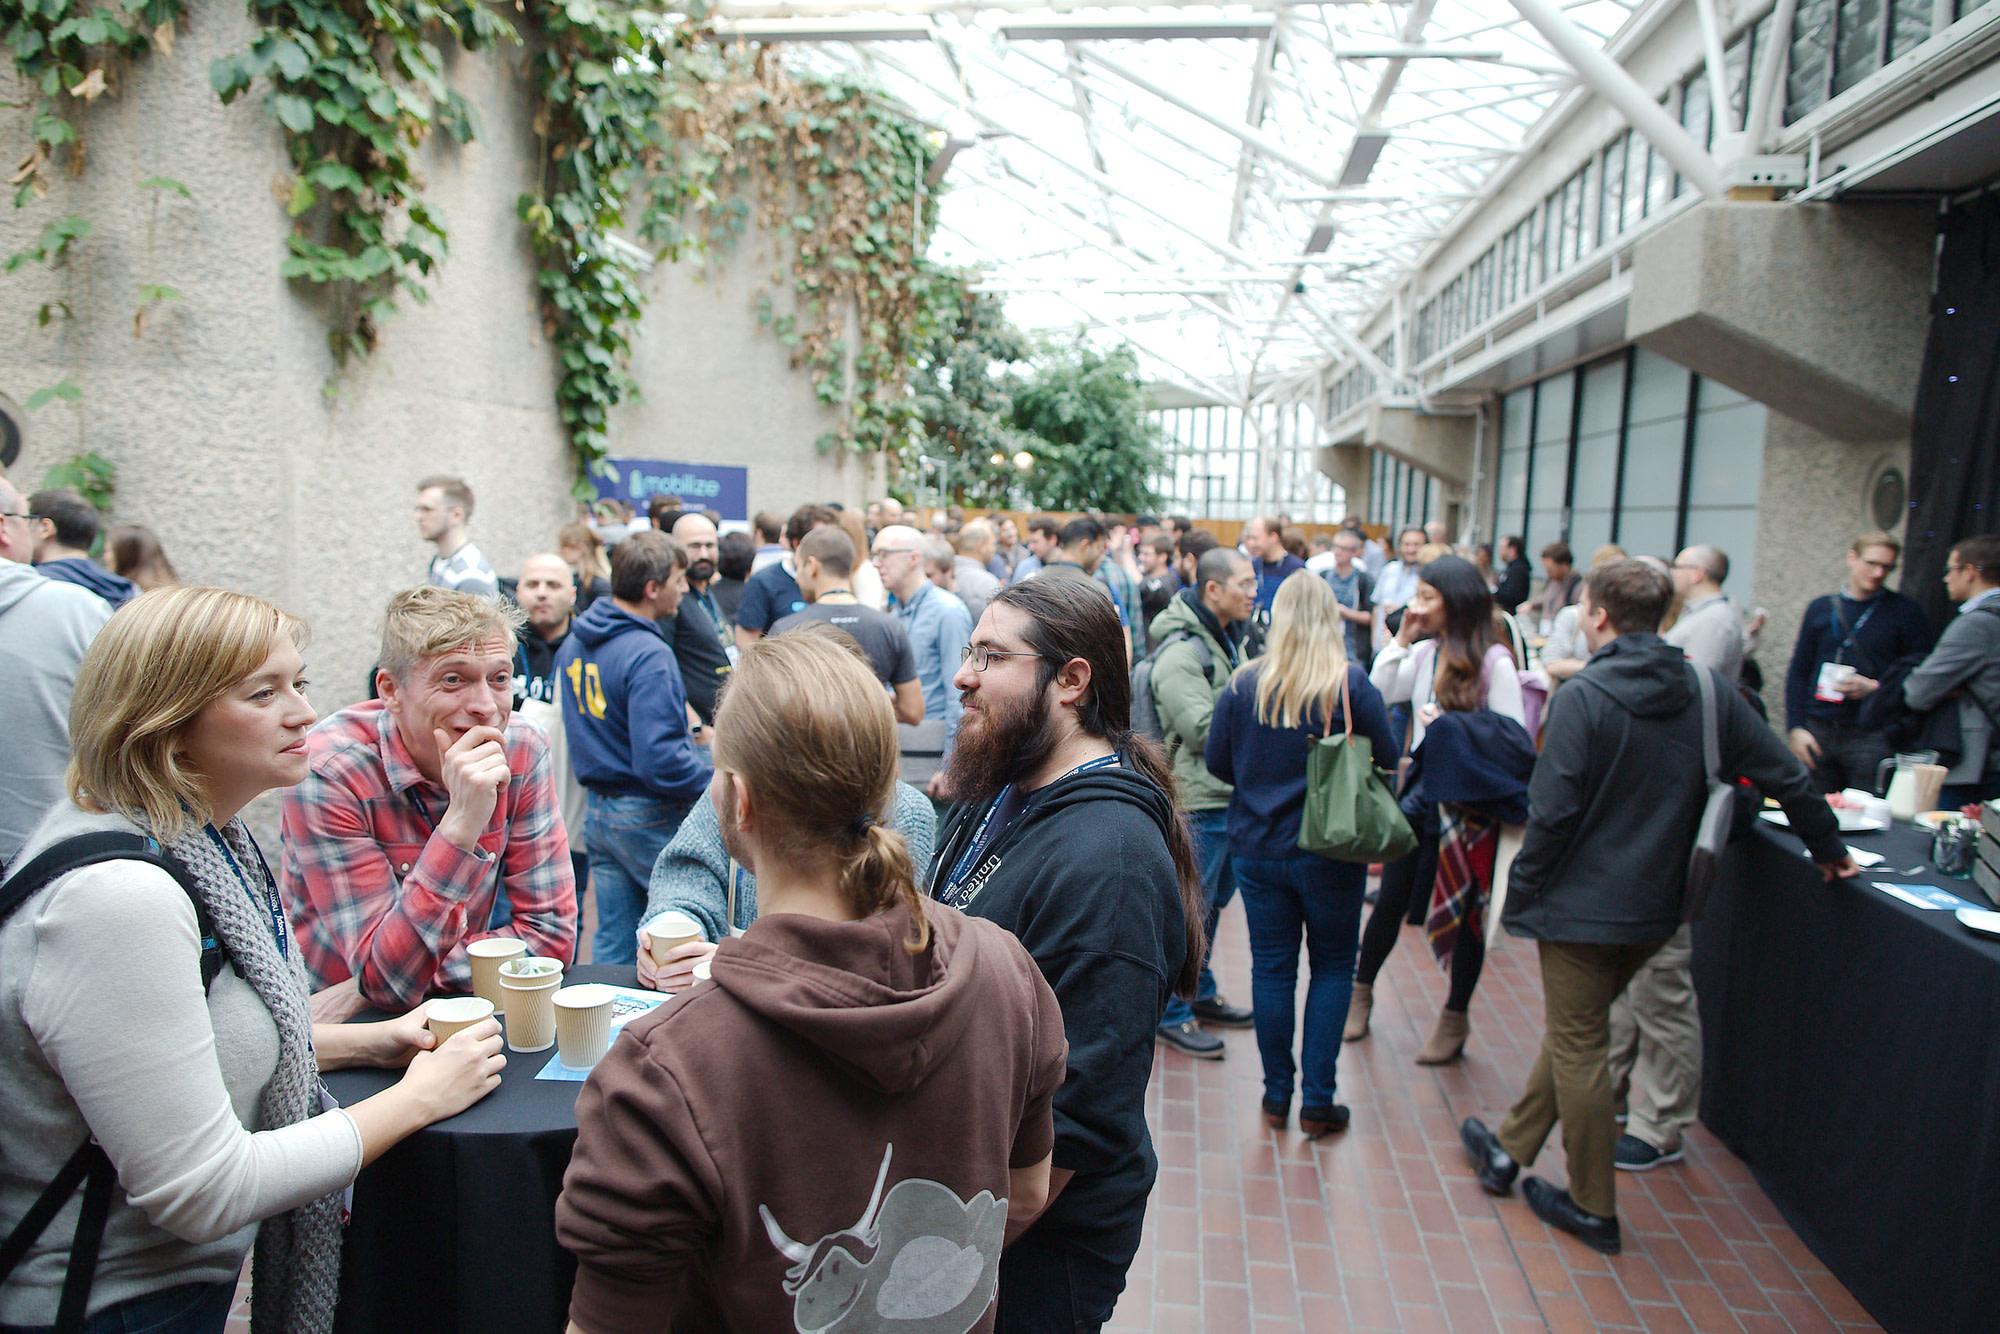 DevRelCon London 2016 crowd